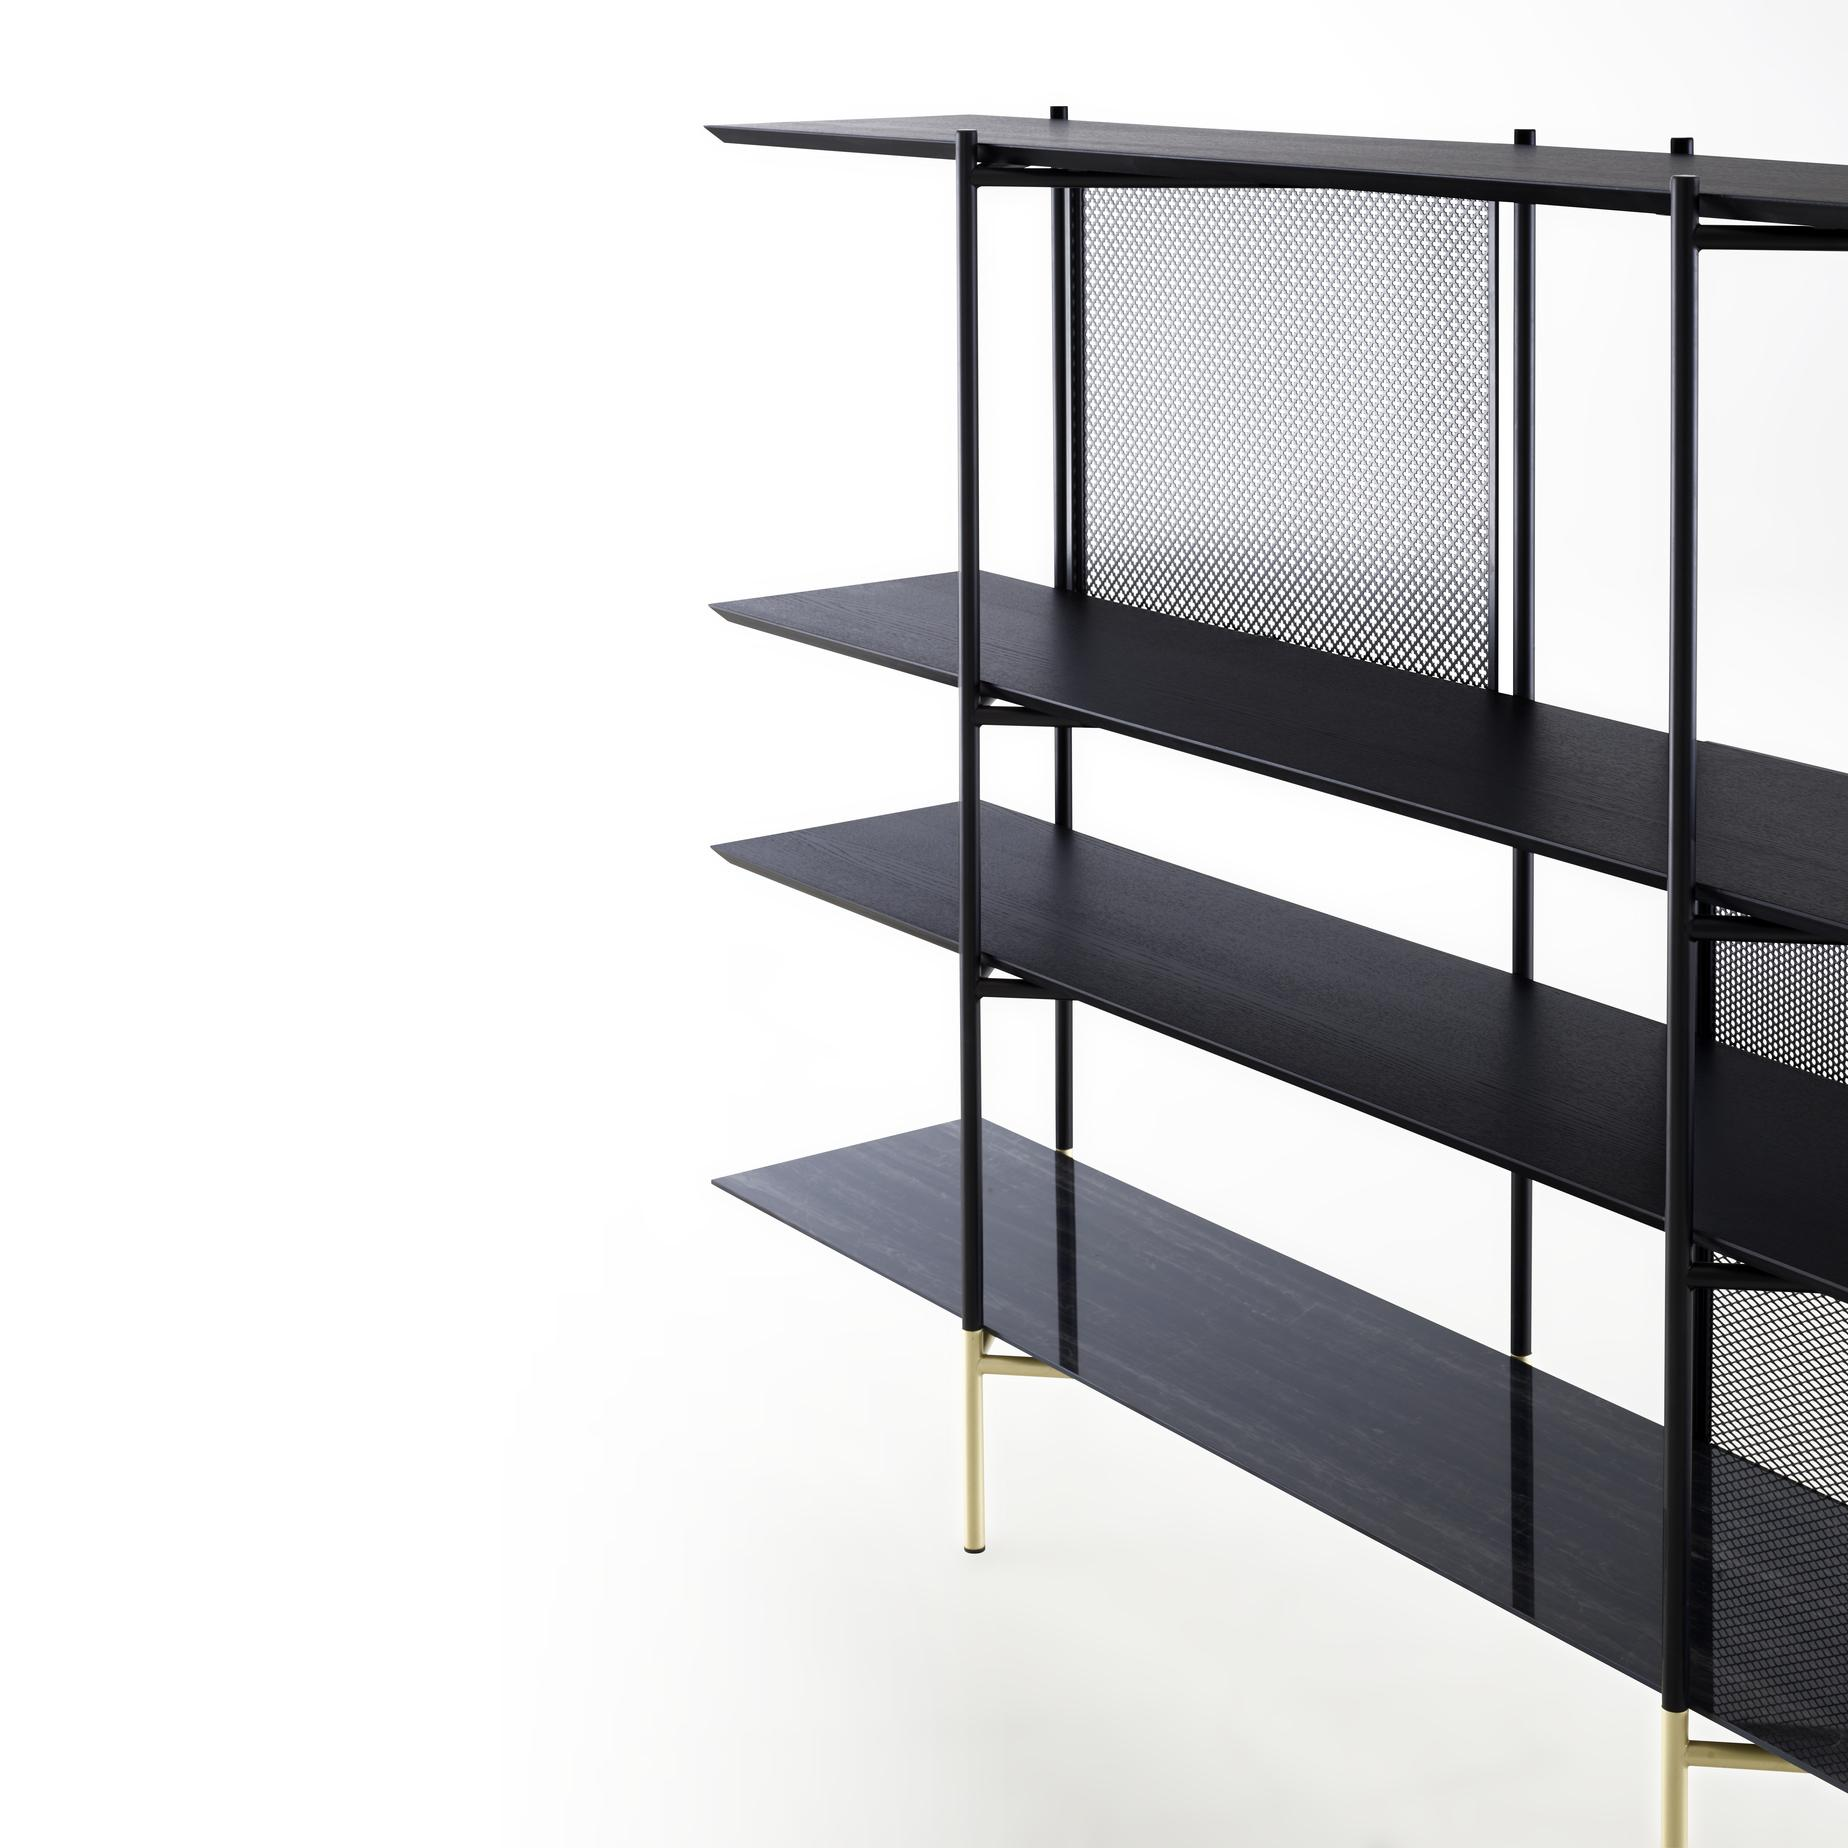 Blennemann Duisburg clyde, shelving units from designer : numéro111 | ligne roset